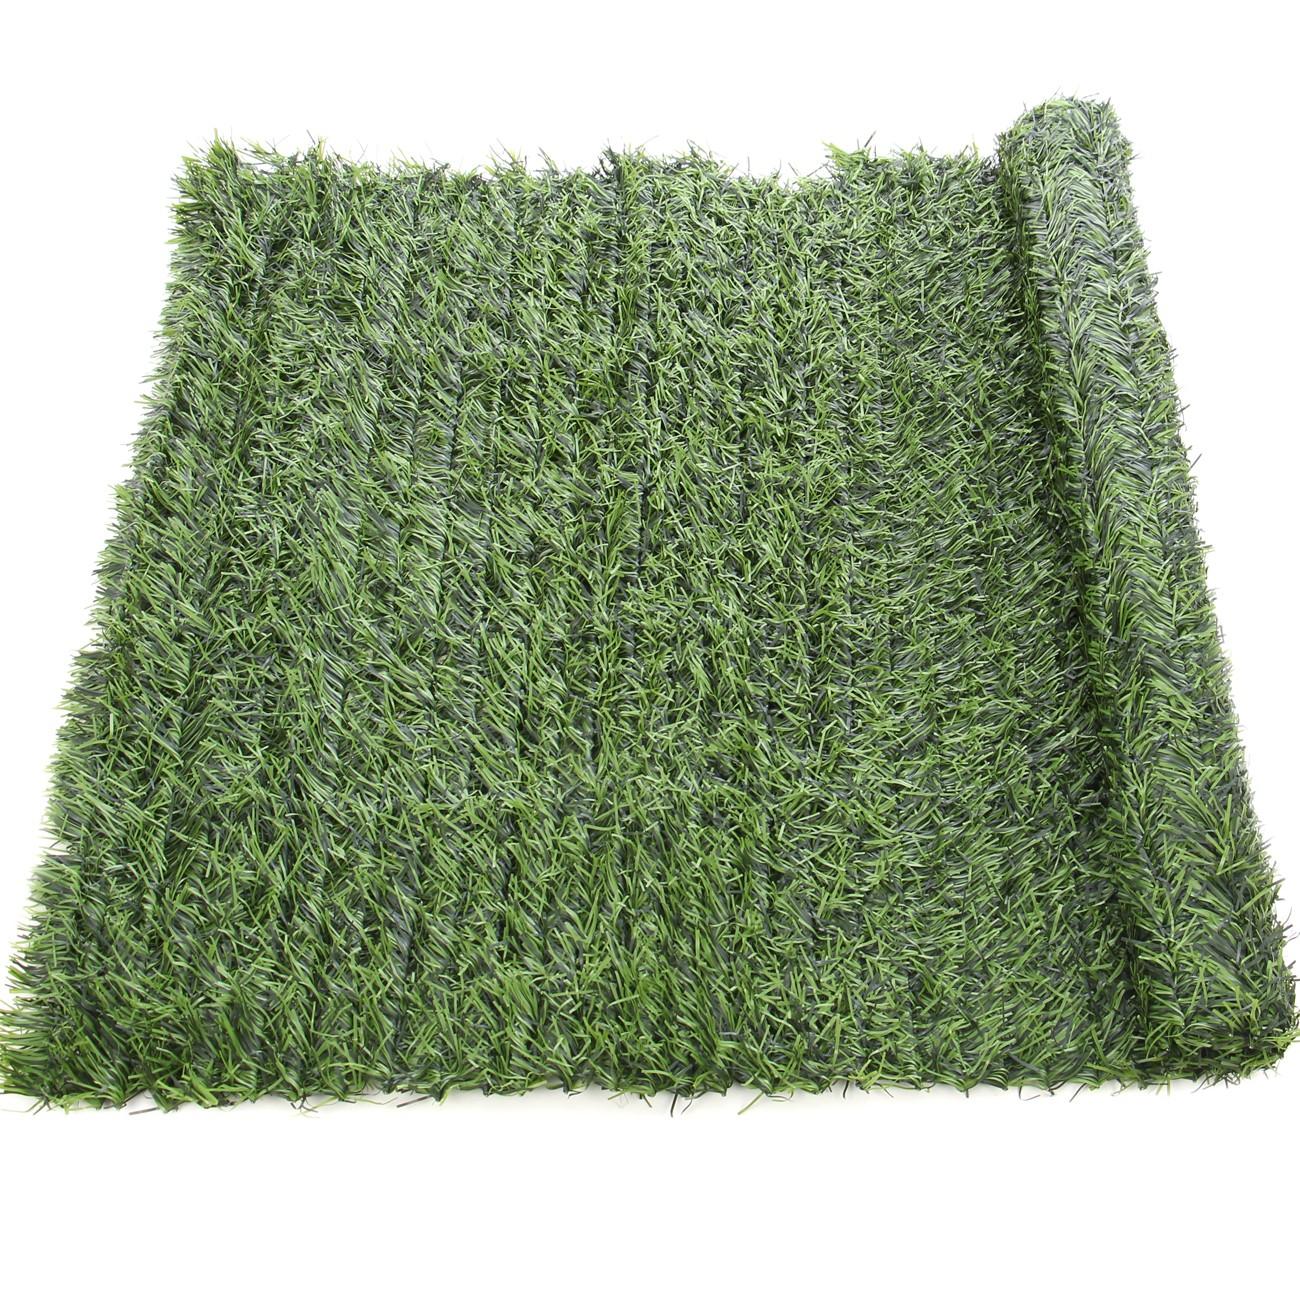 Gard artificial, model Conifere, 100 x 300 cm